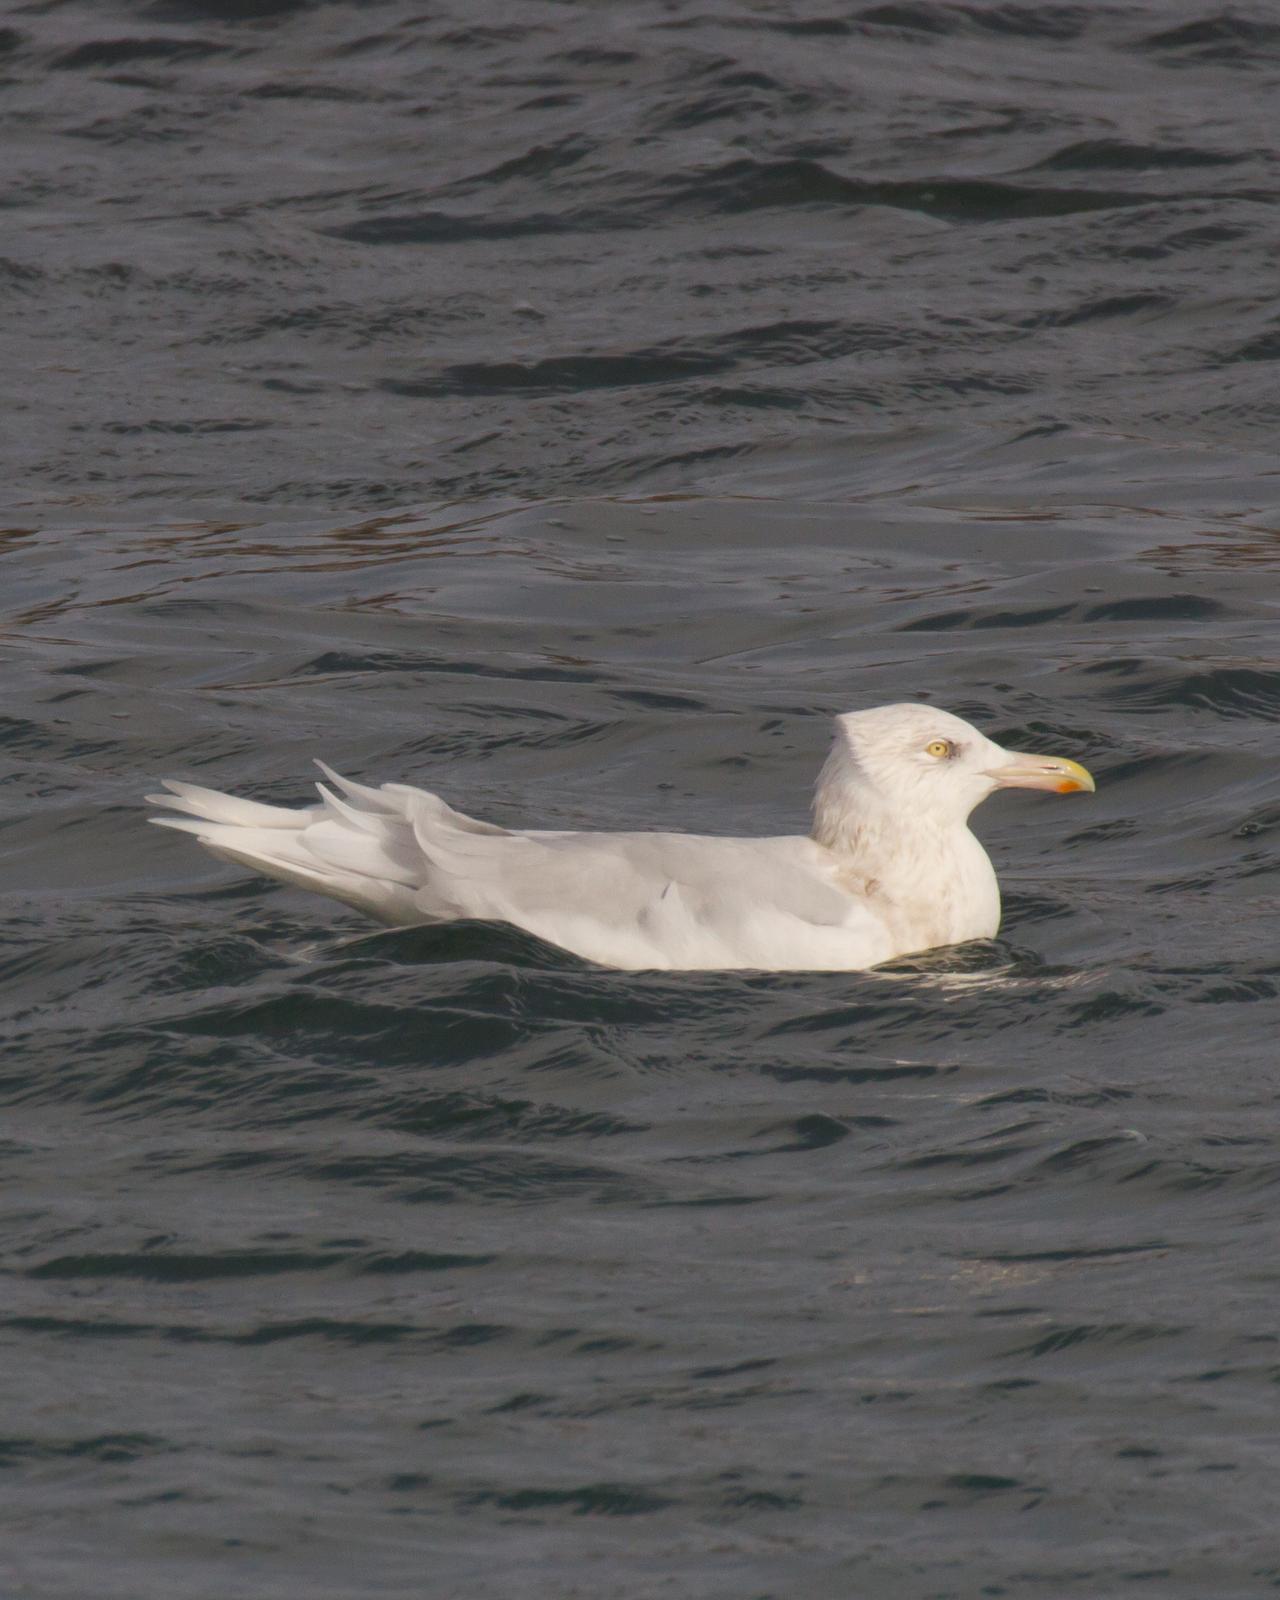 Glaucous Gull Photo by Kasia  Ganderska Someya